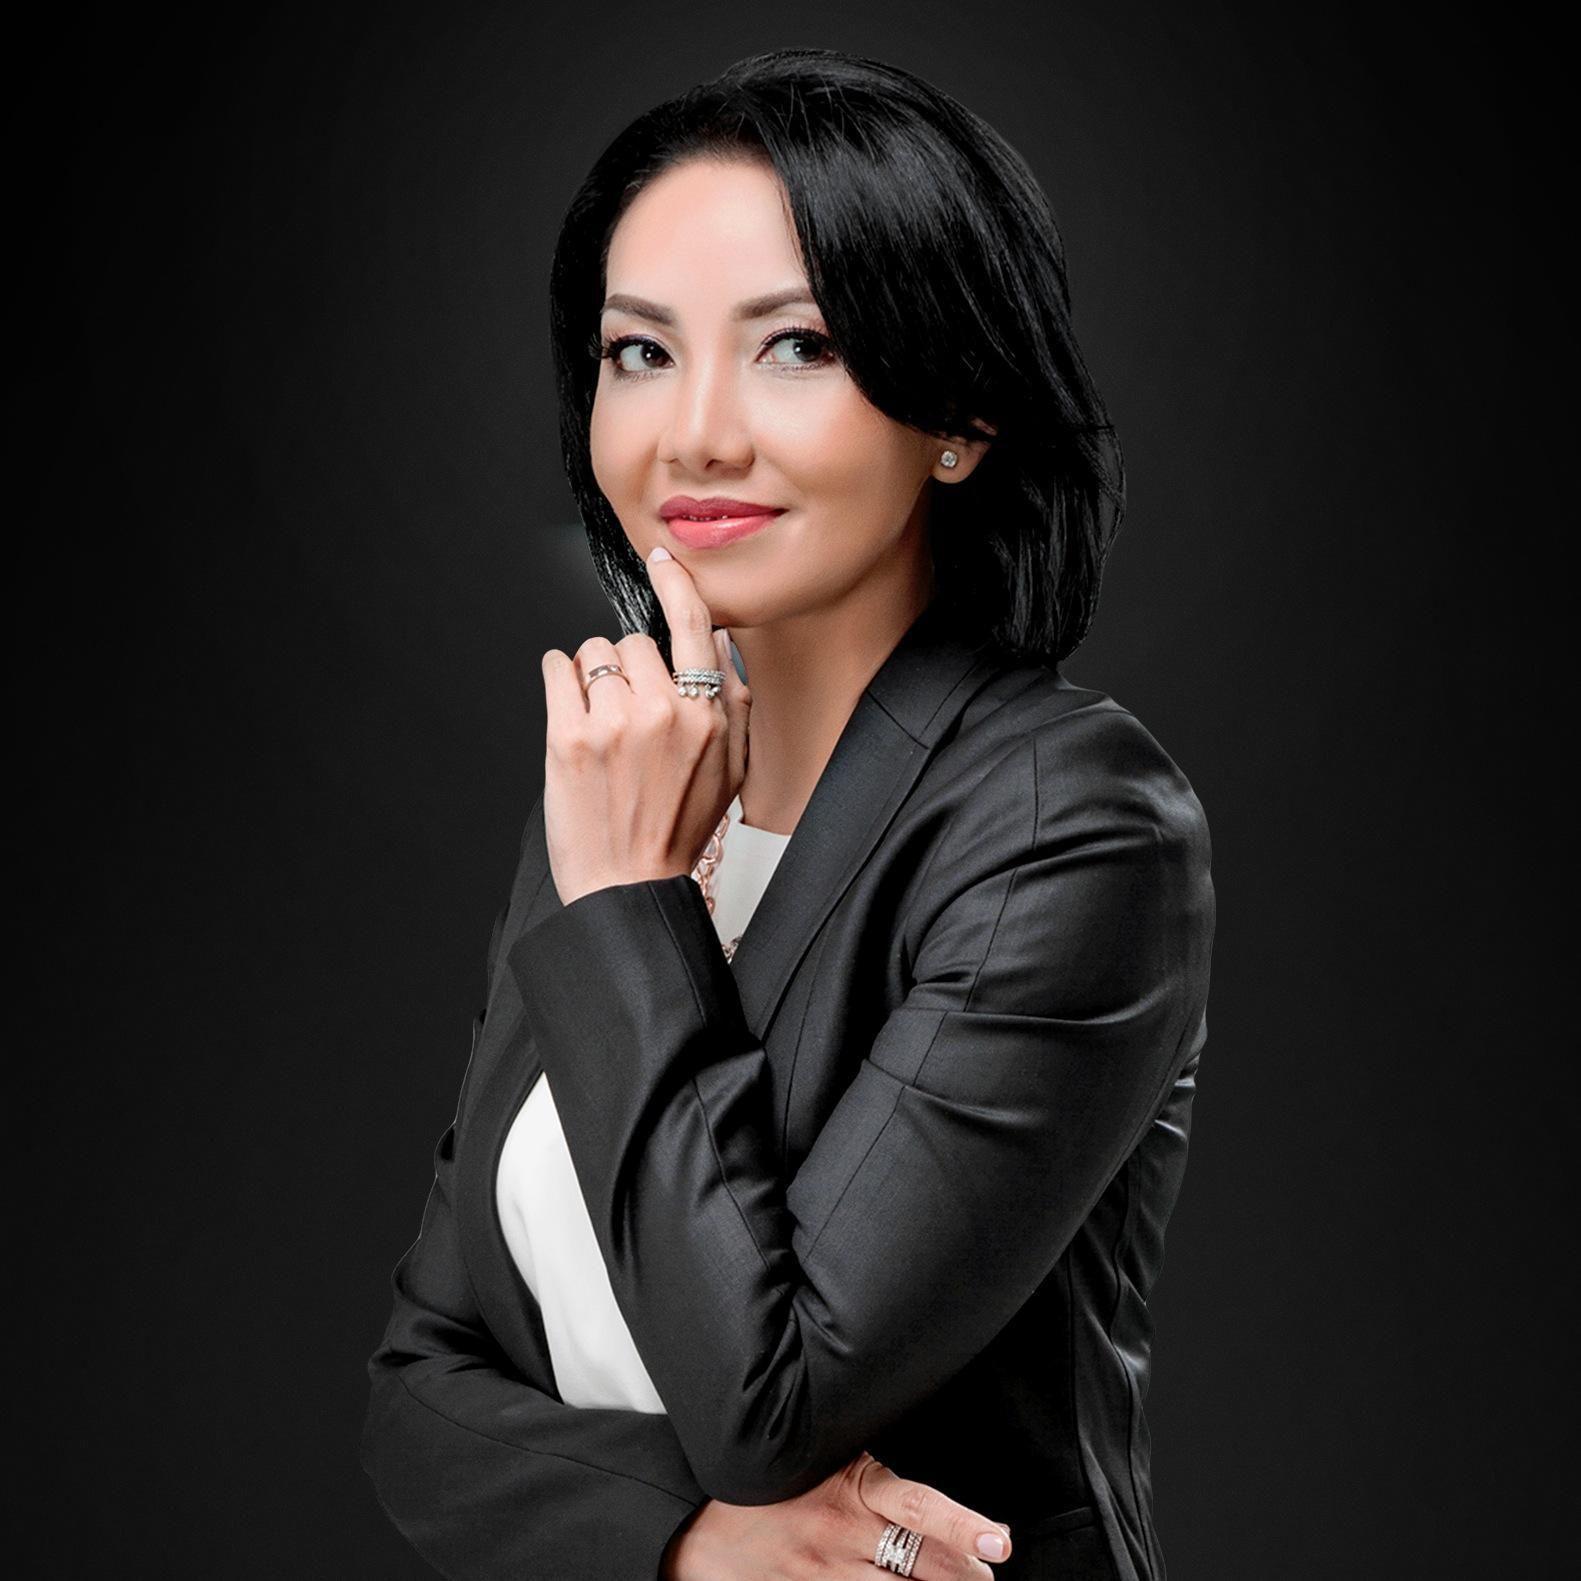 Shinta Bubu on Women in Tech and the Digital Landscape